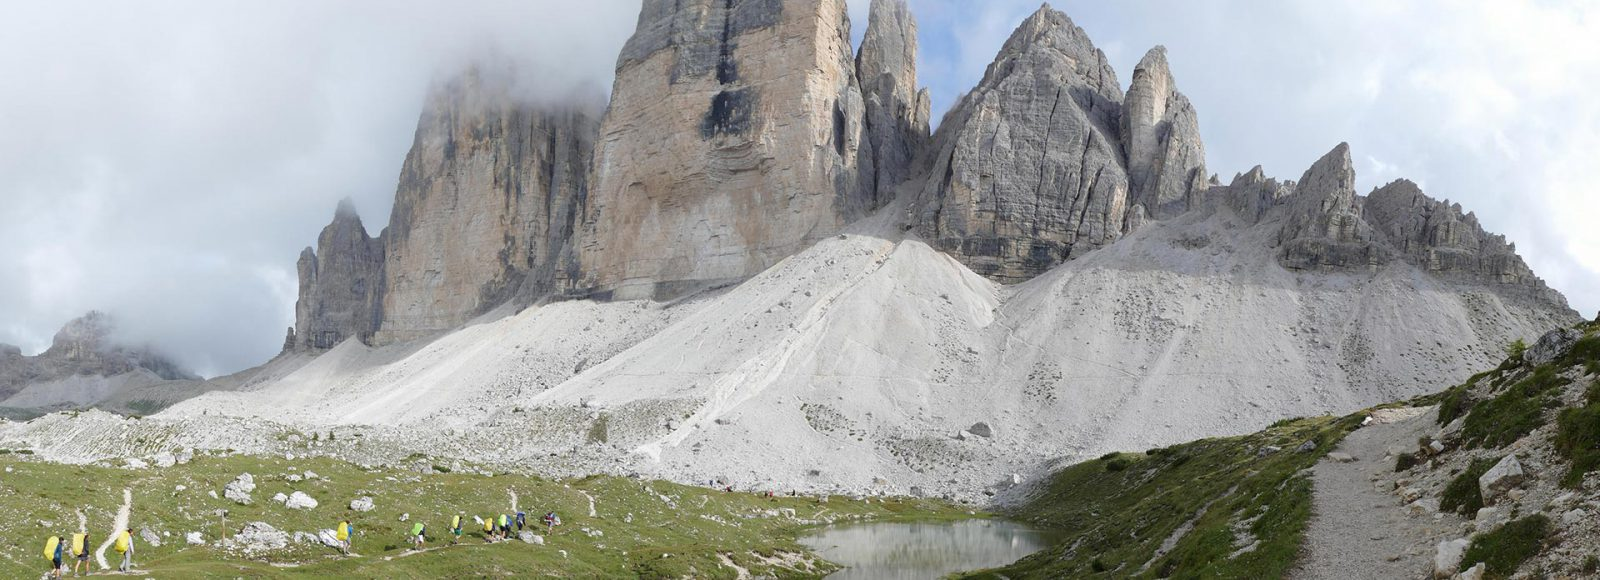 slide1-alpinia